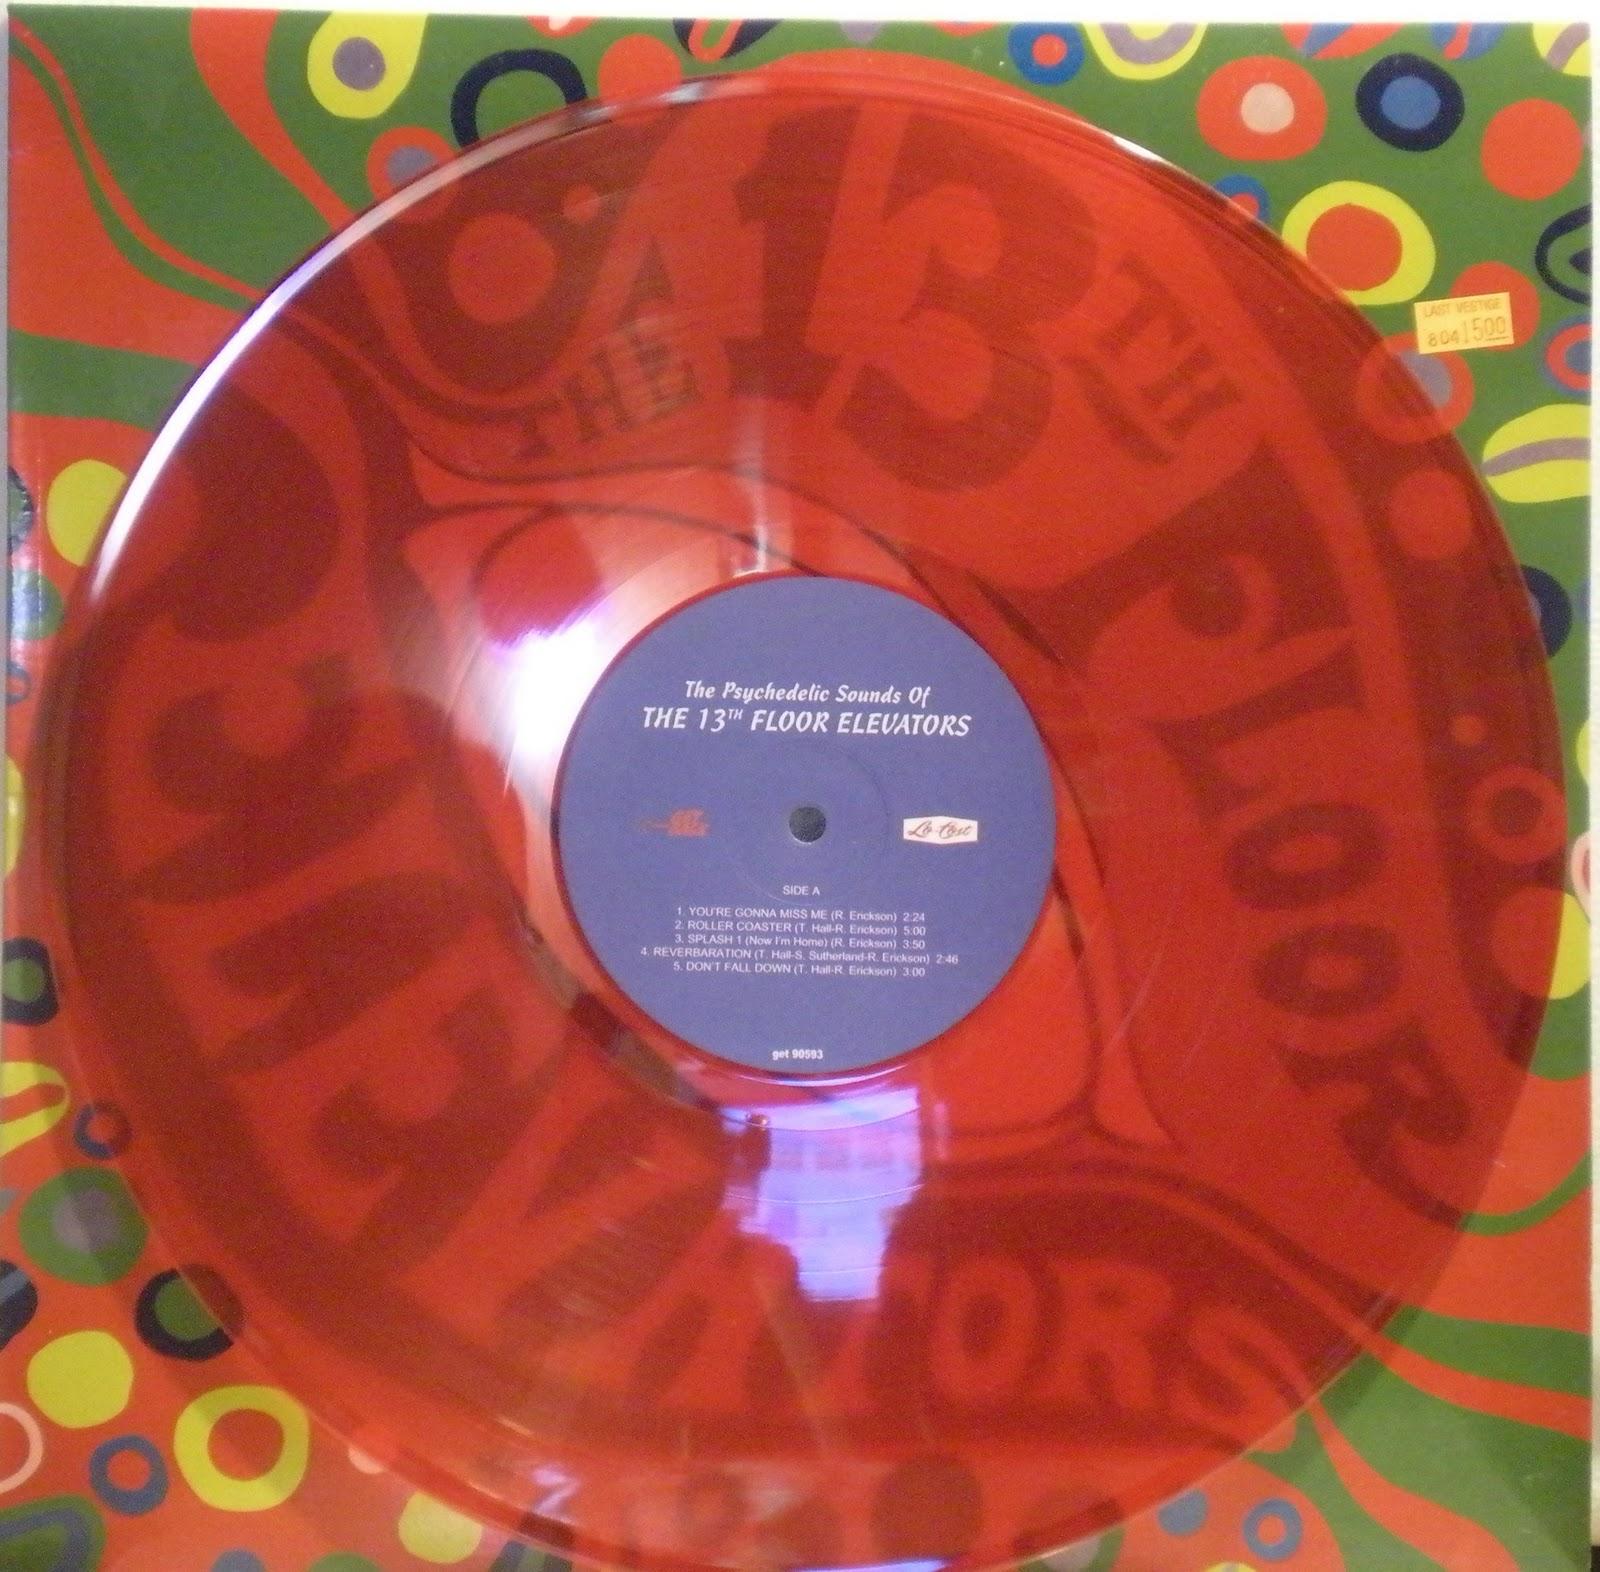 Catch a groove more multi colored vinyl for 13th floor elevators vinyl box set